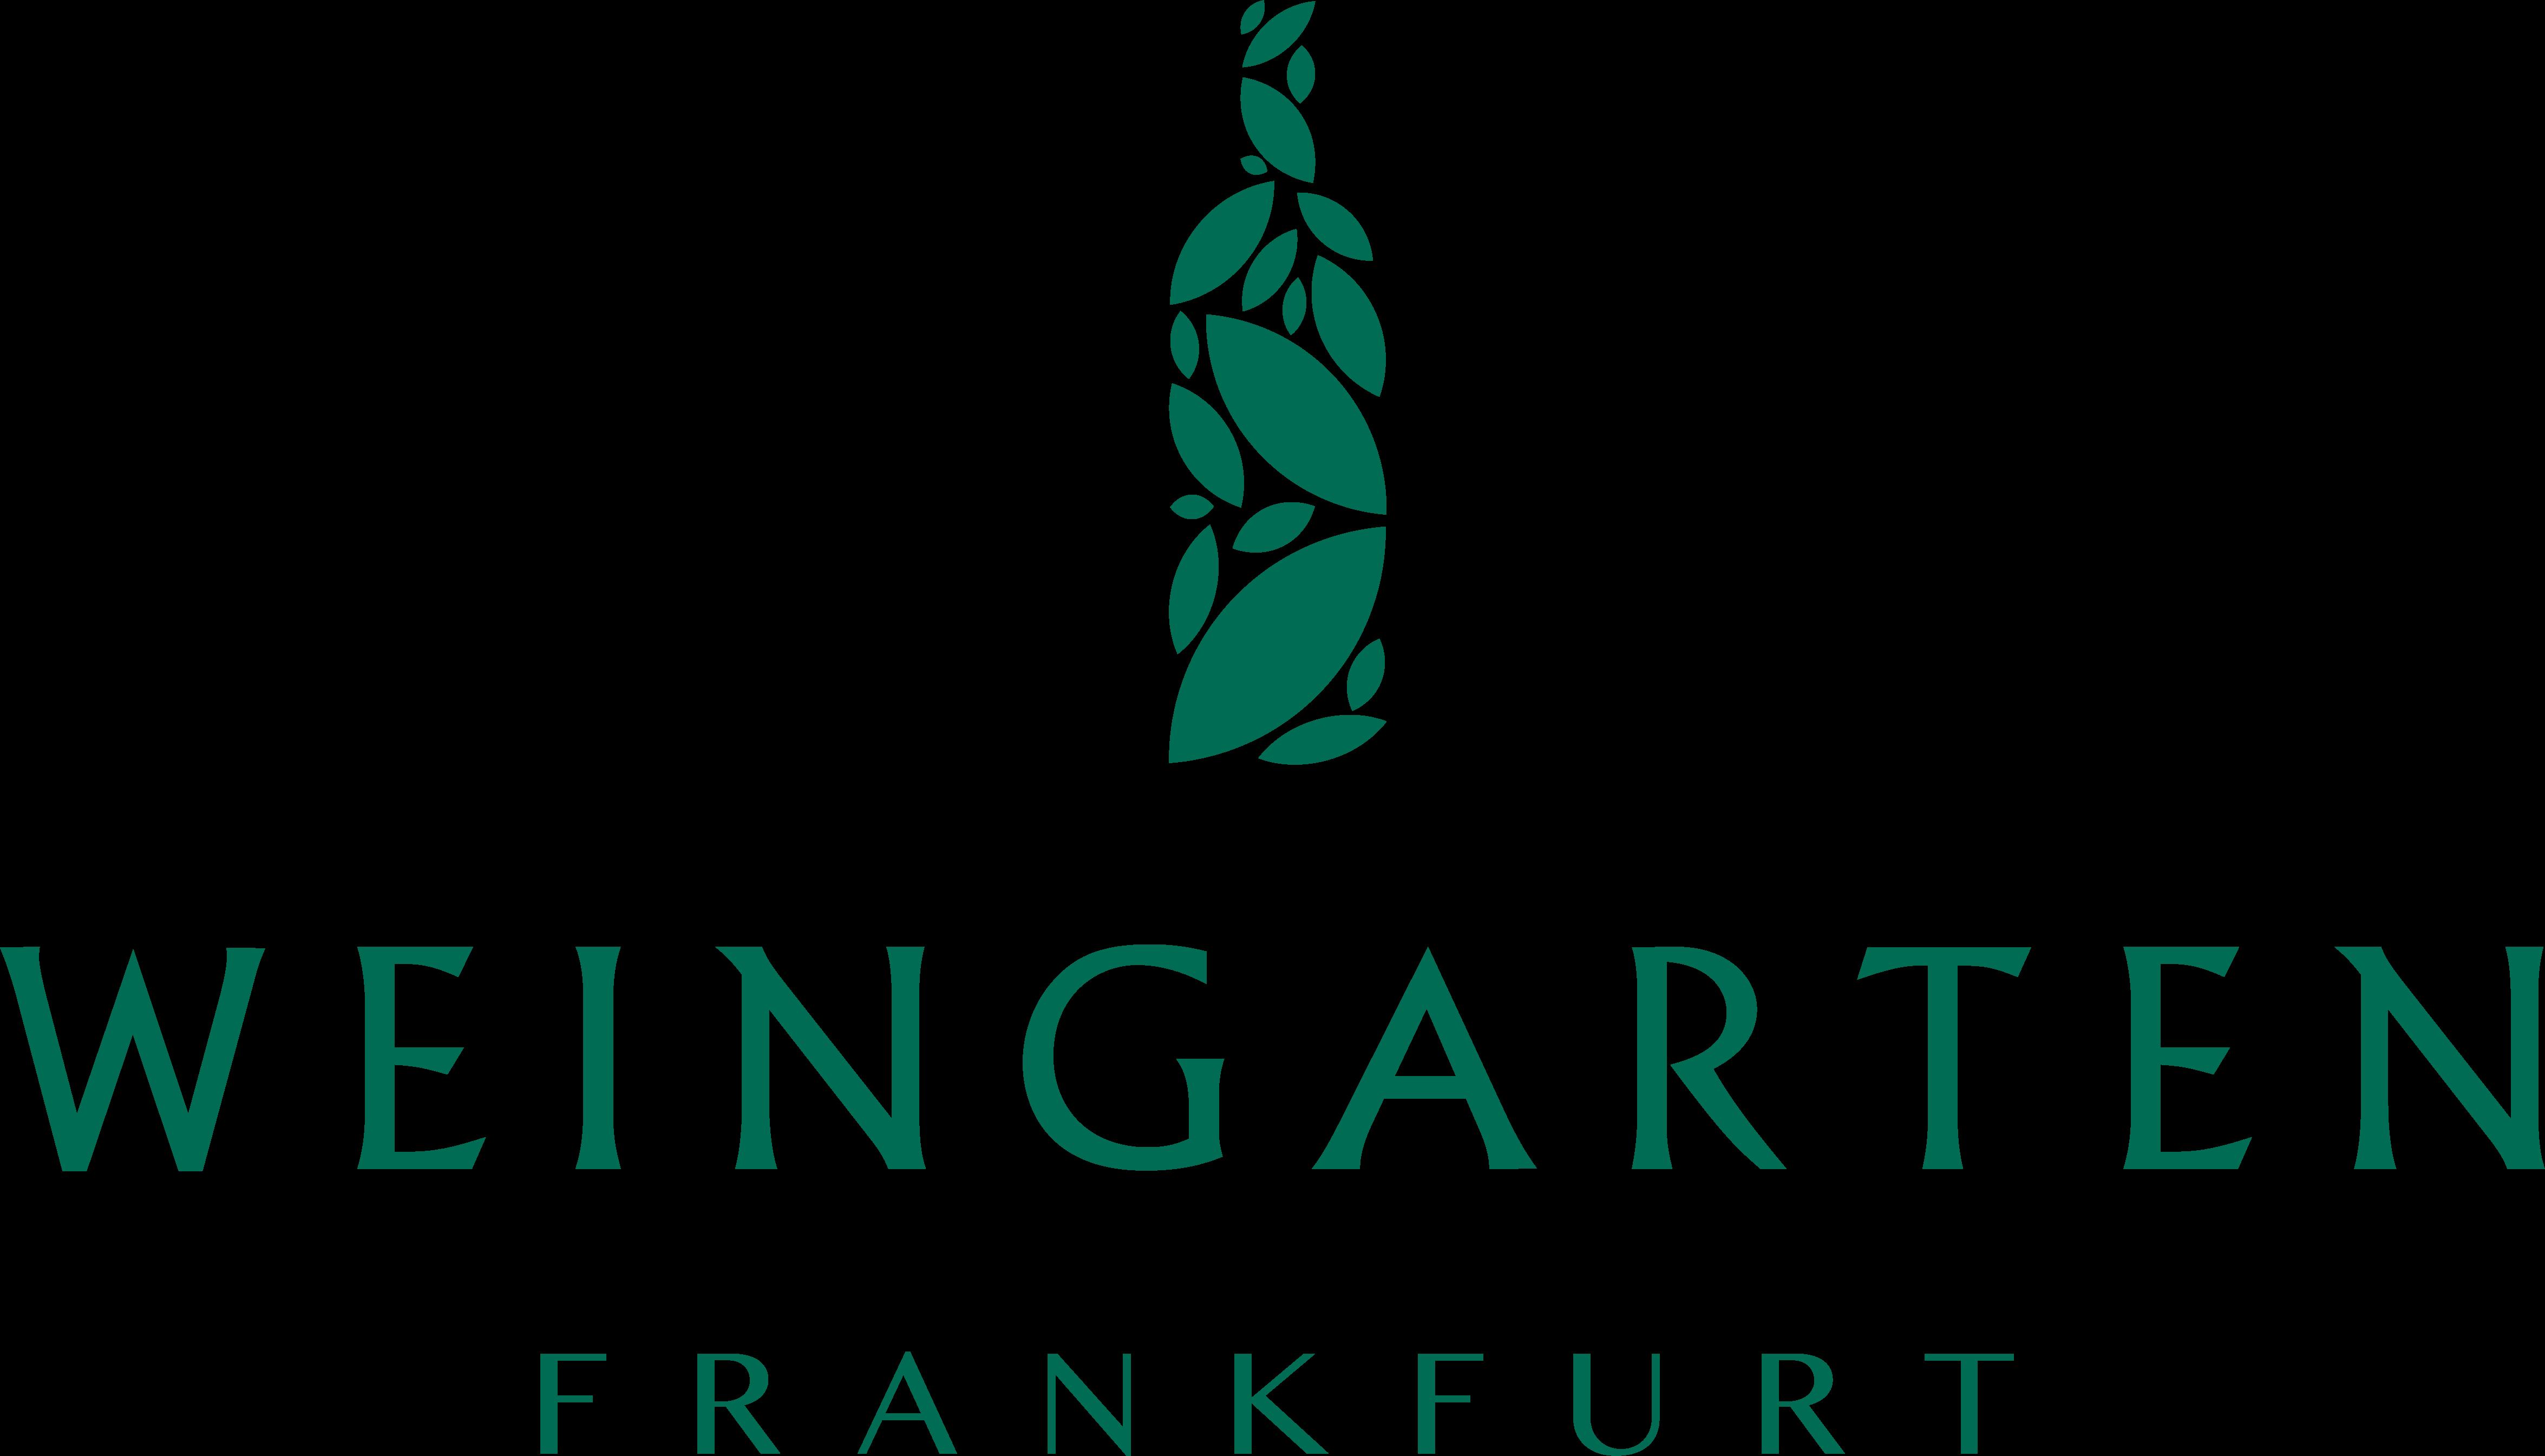 Weingarten-Frankfurt